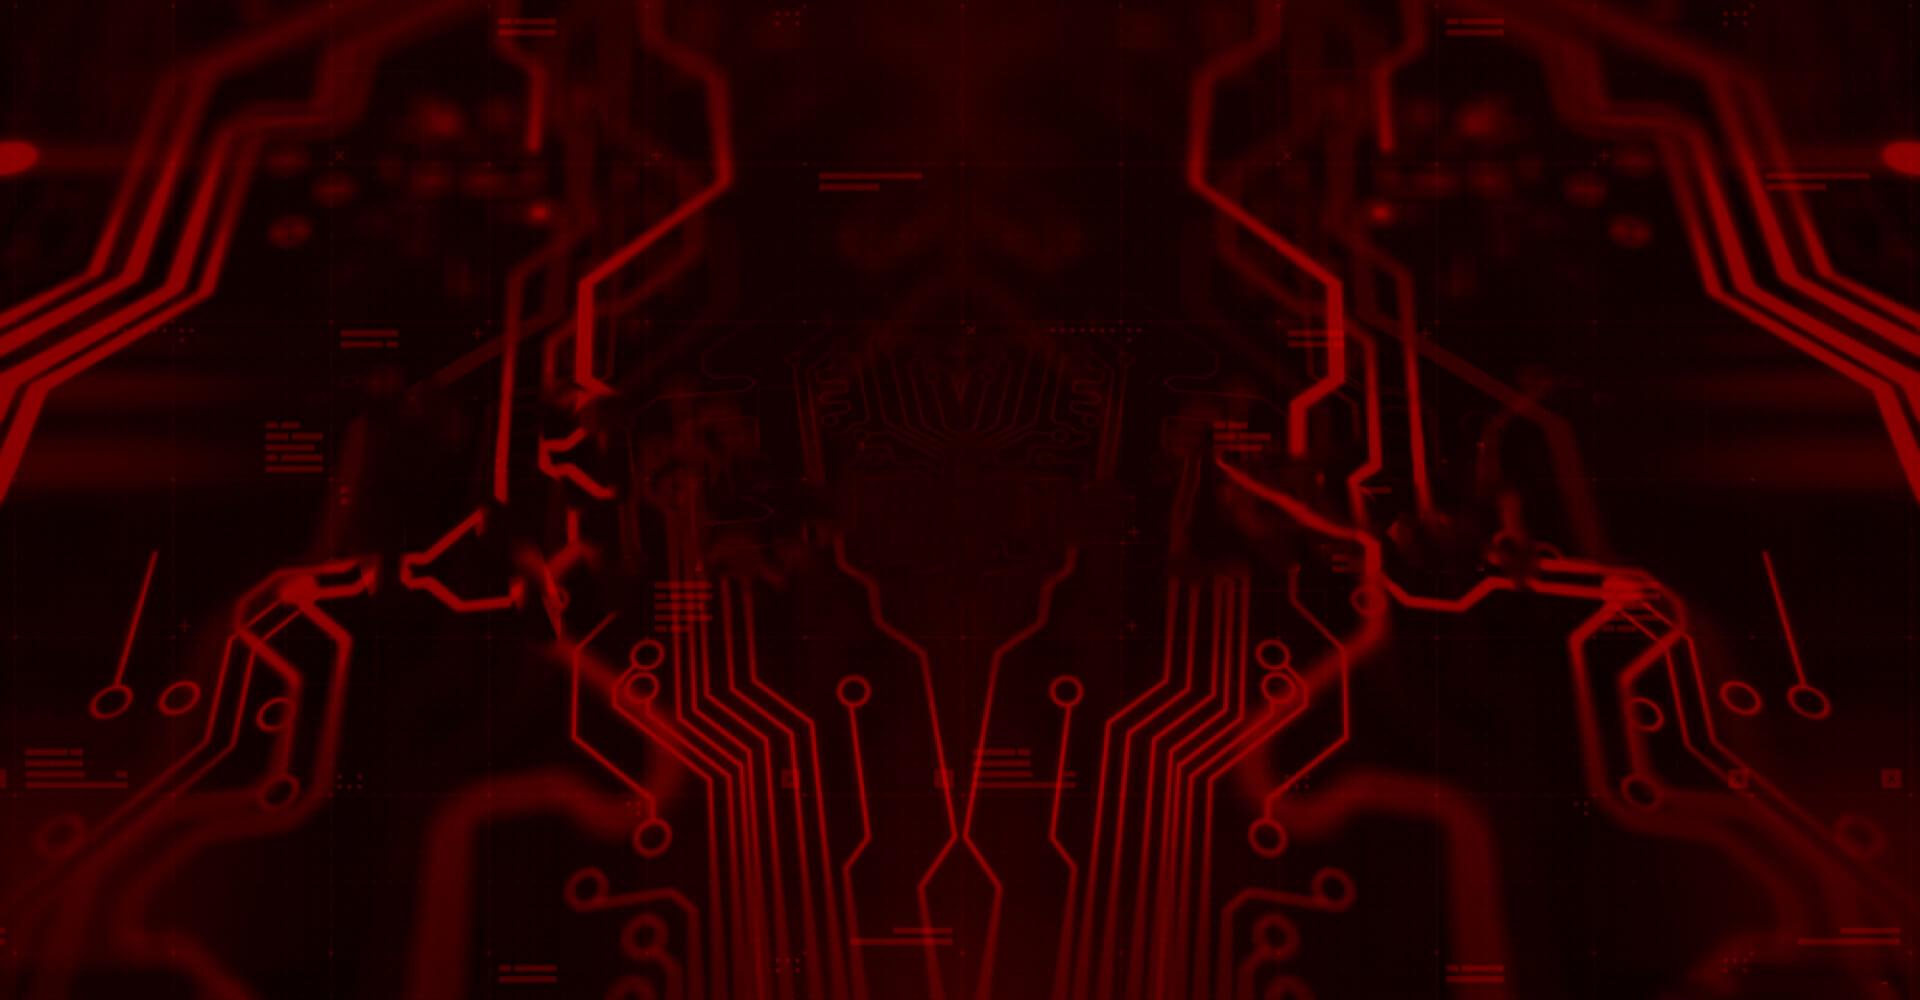 https://robotec.ai/wp-content/uploads/2020/05/zaslepka1.jpg